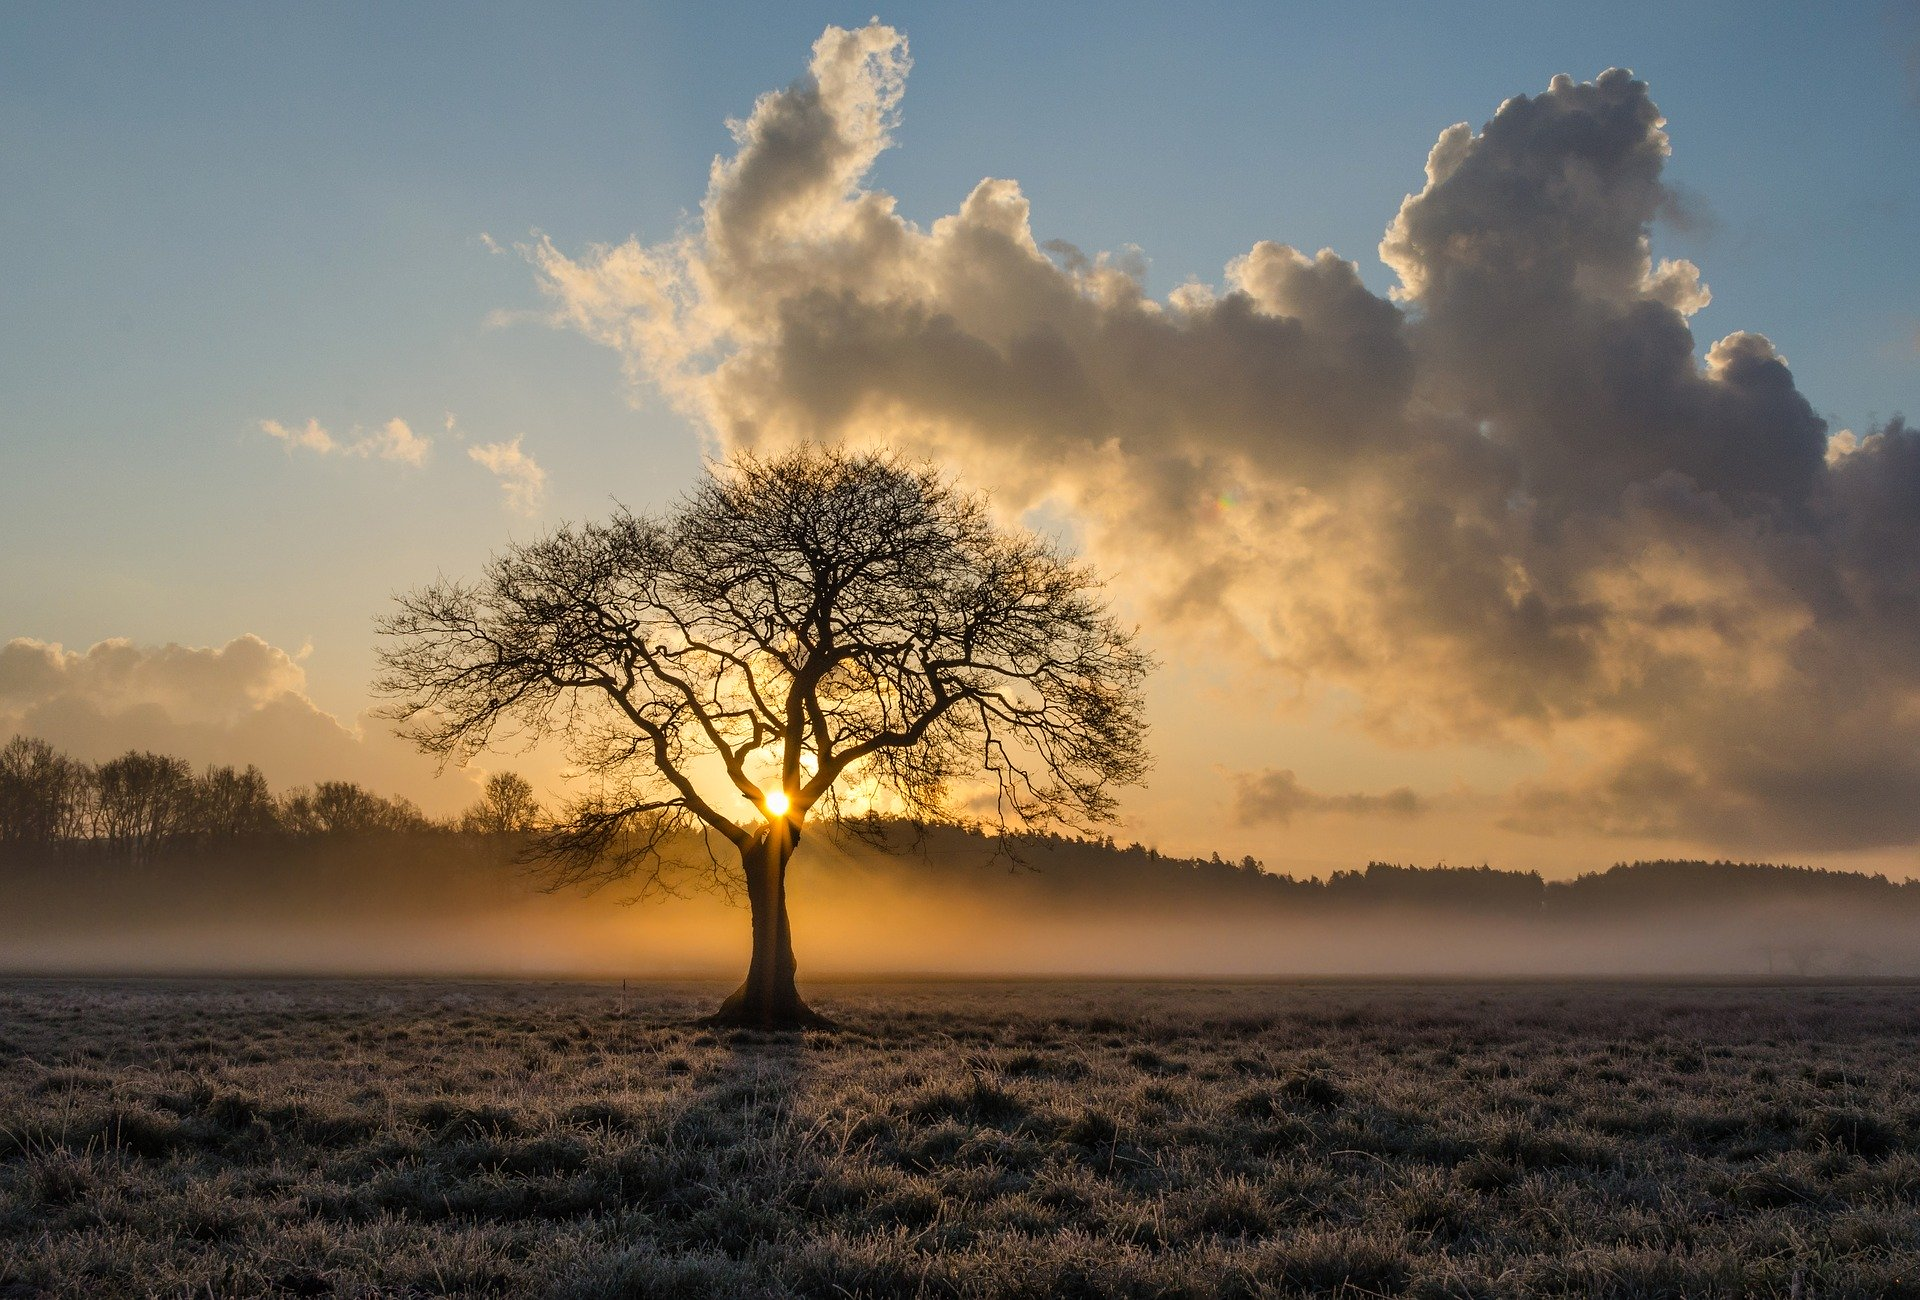 lone-tree-1934897_1920.jpg